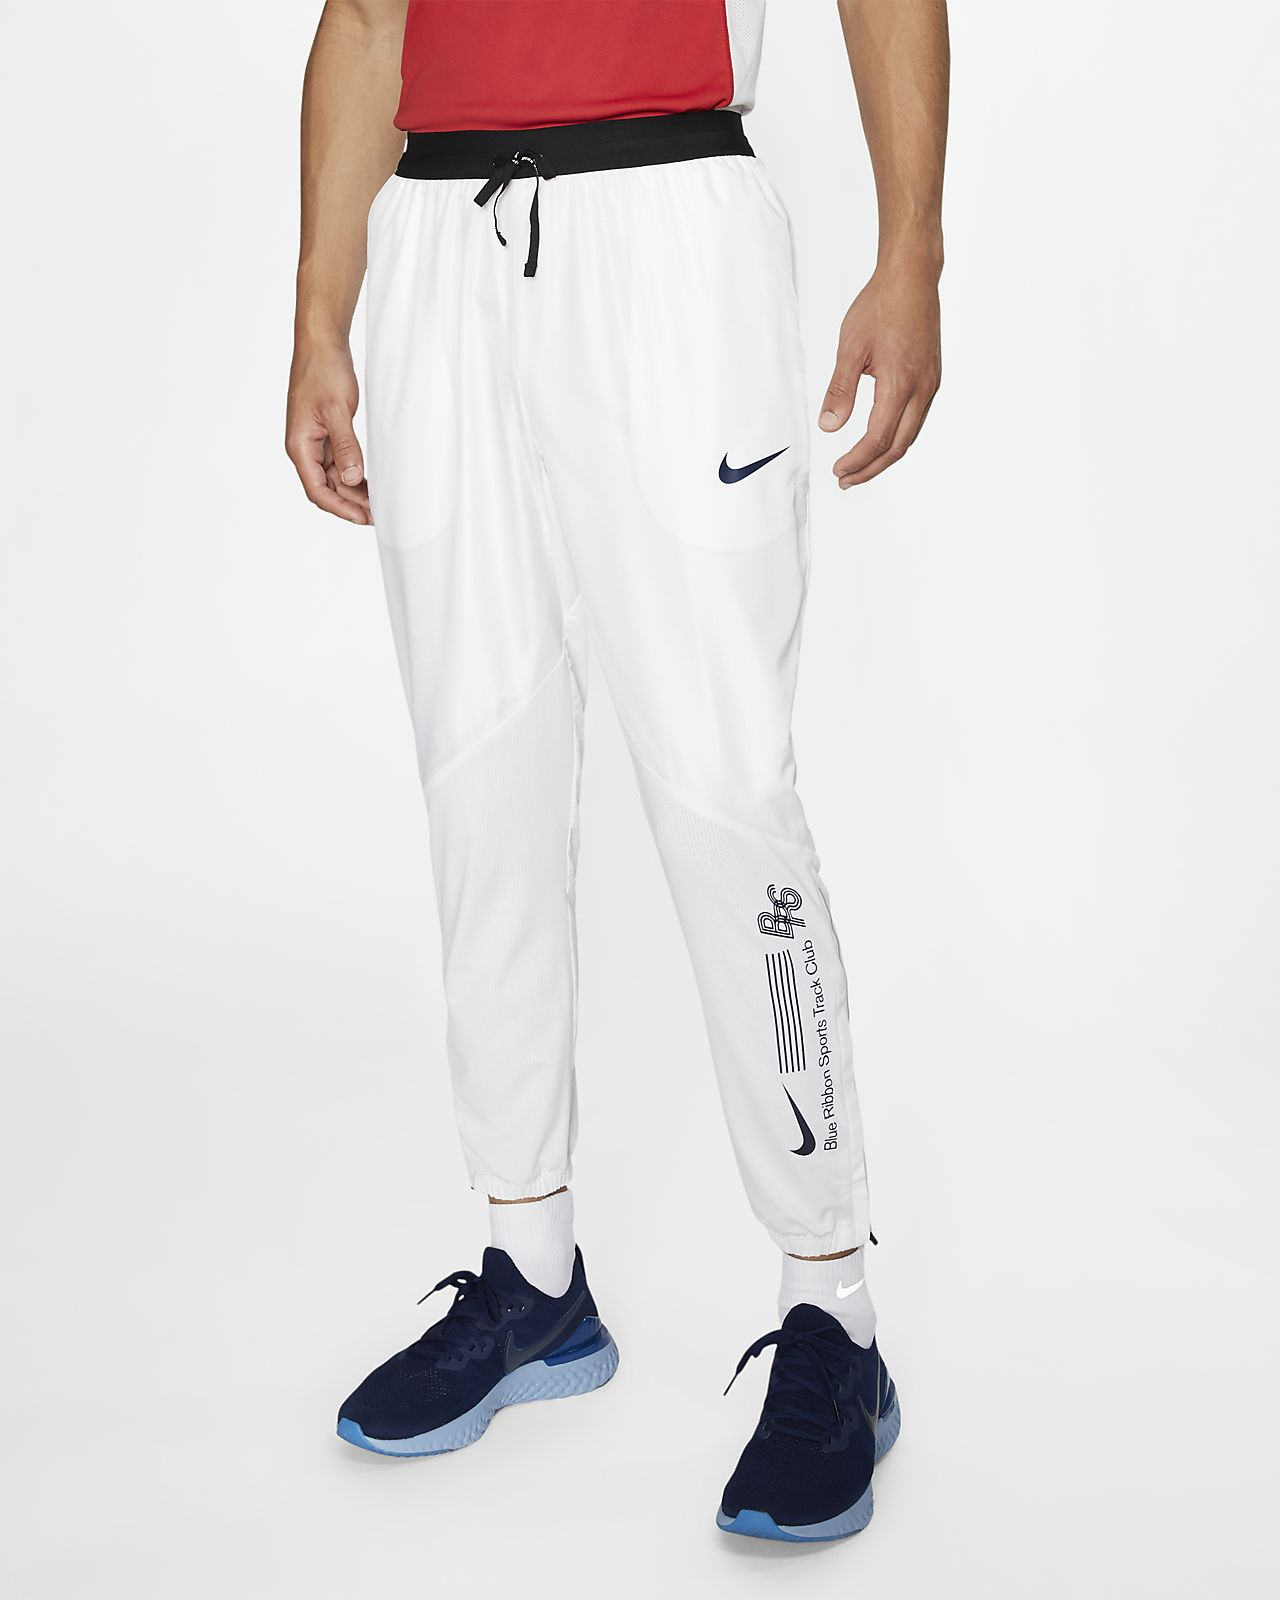 Nike BRS Running Track Pants